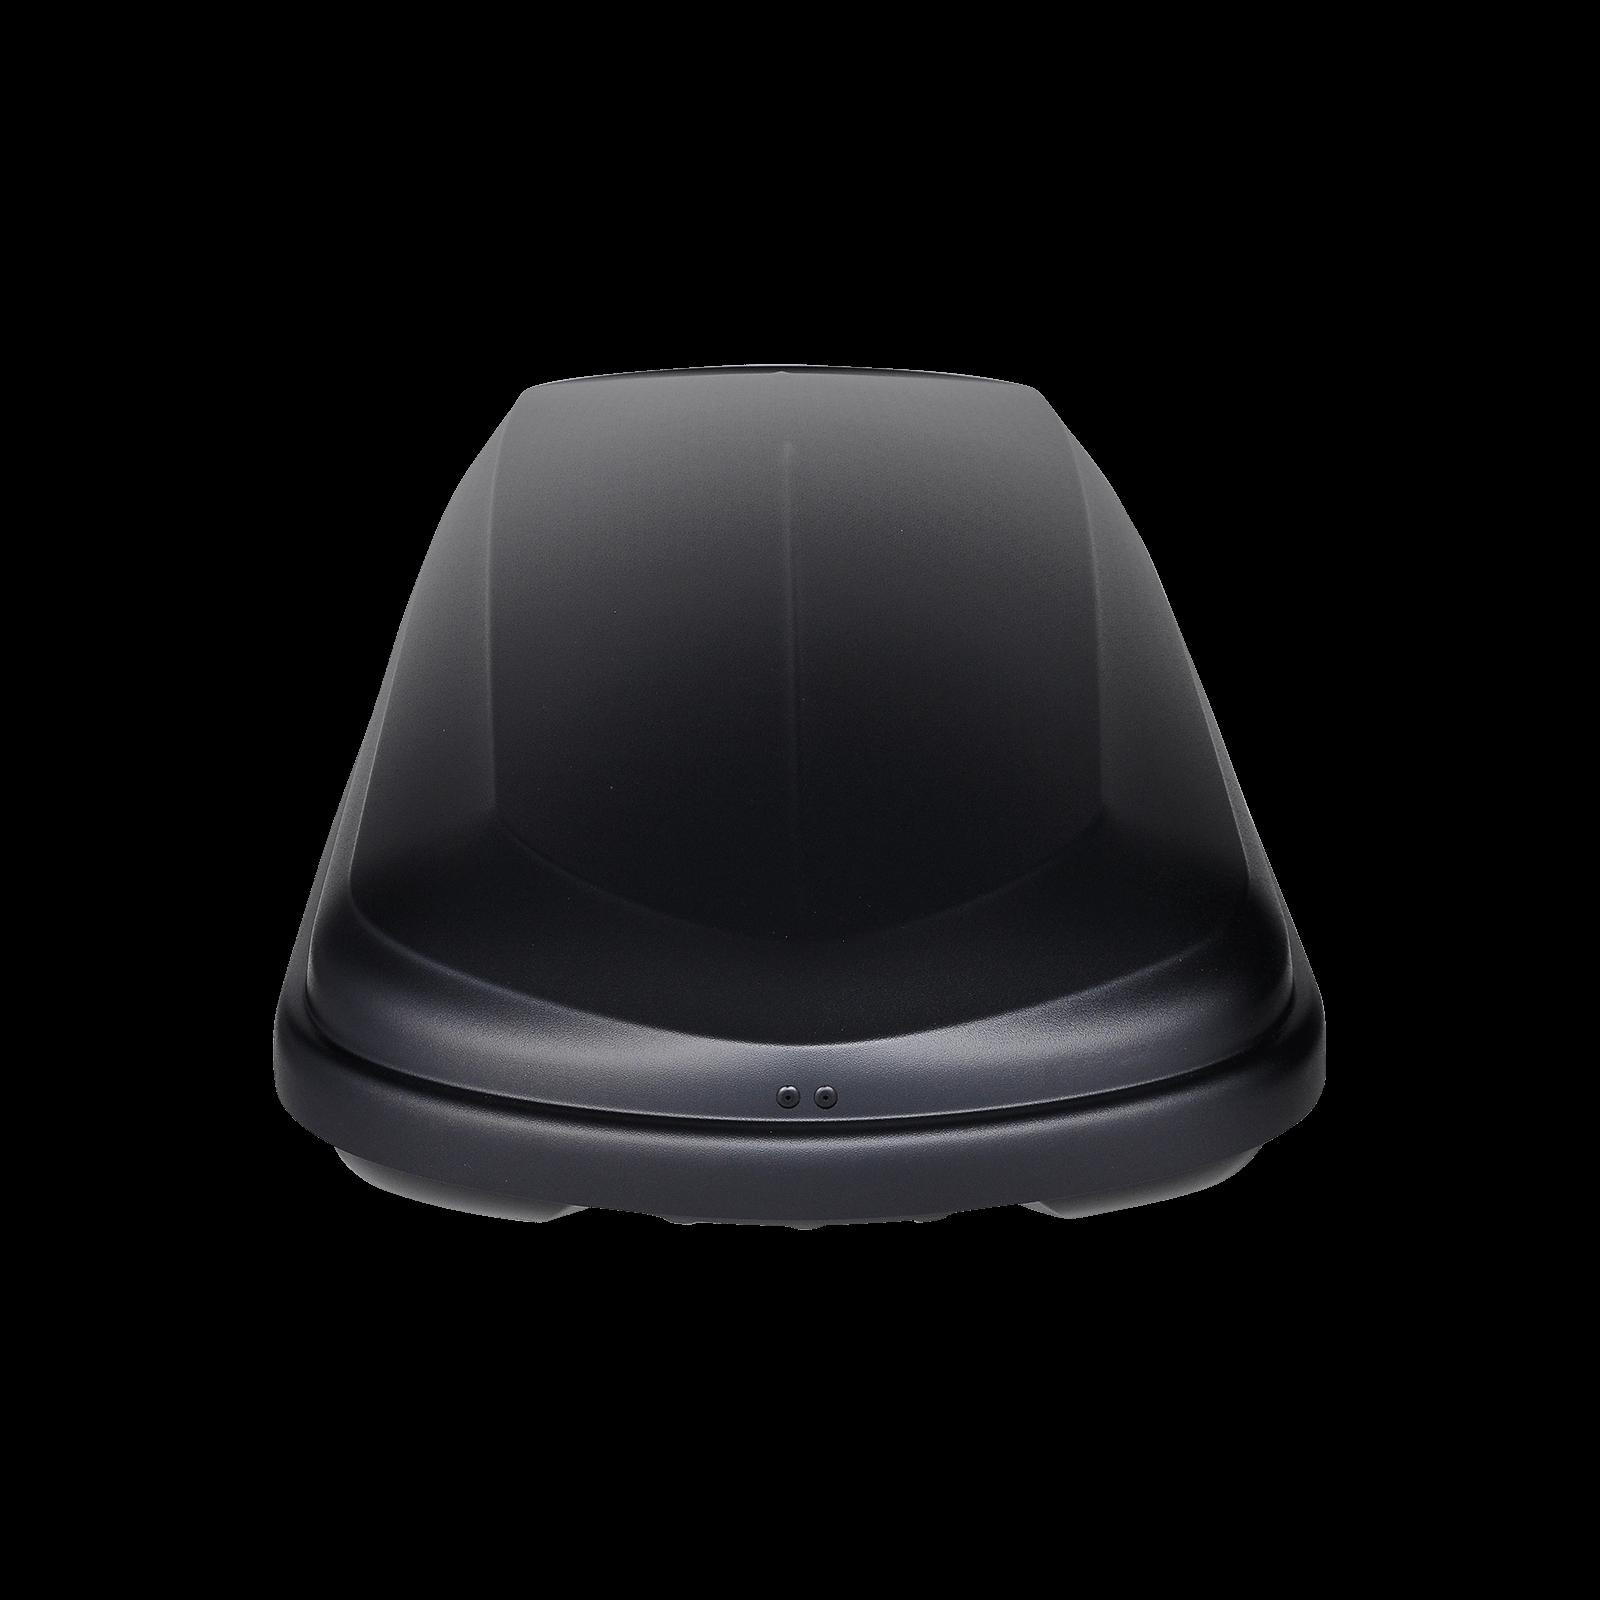 Dachbox Hapro Traxer 6.6 Anthracite - Bild 3